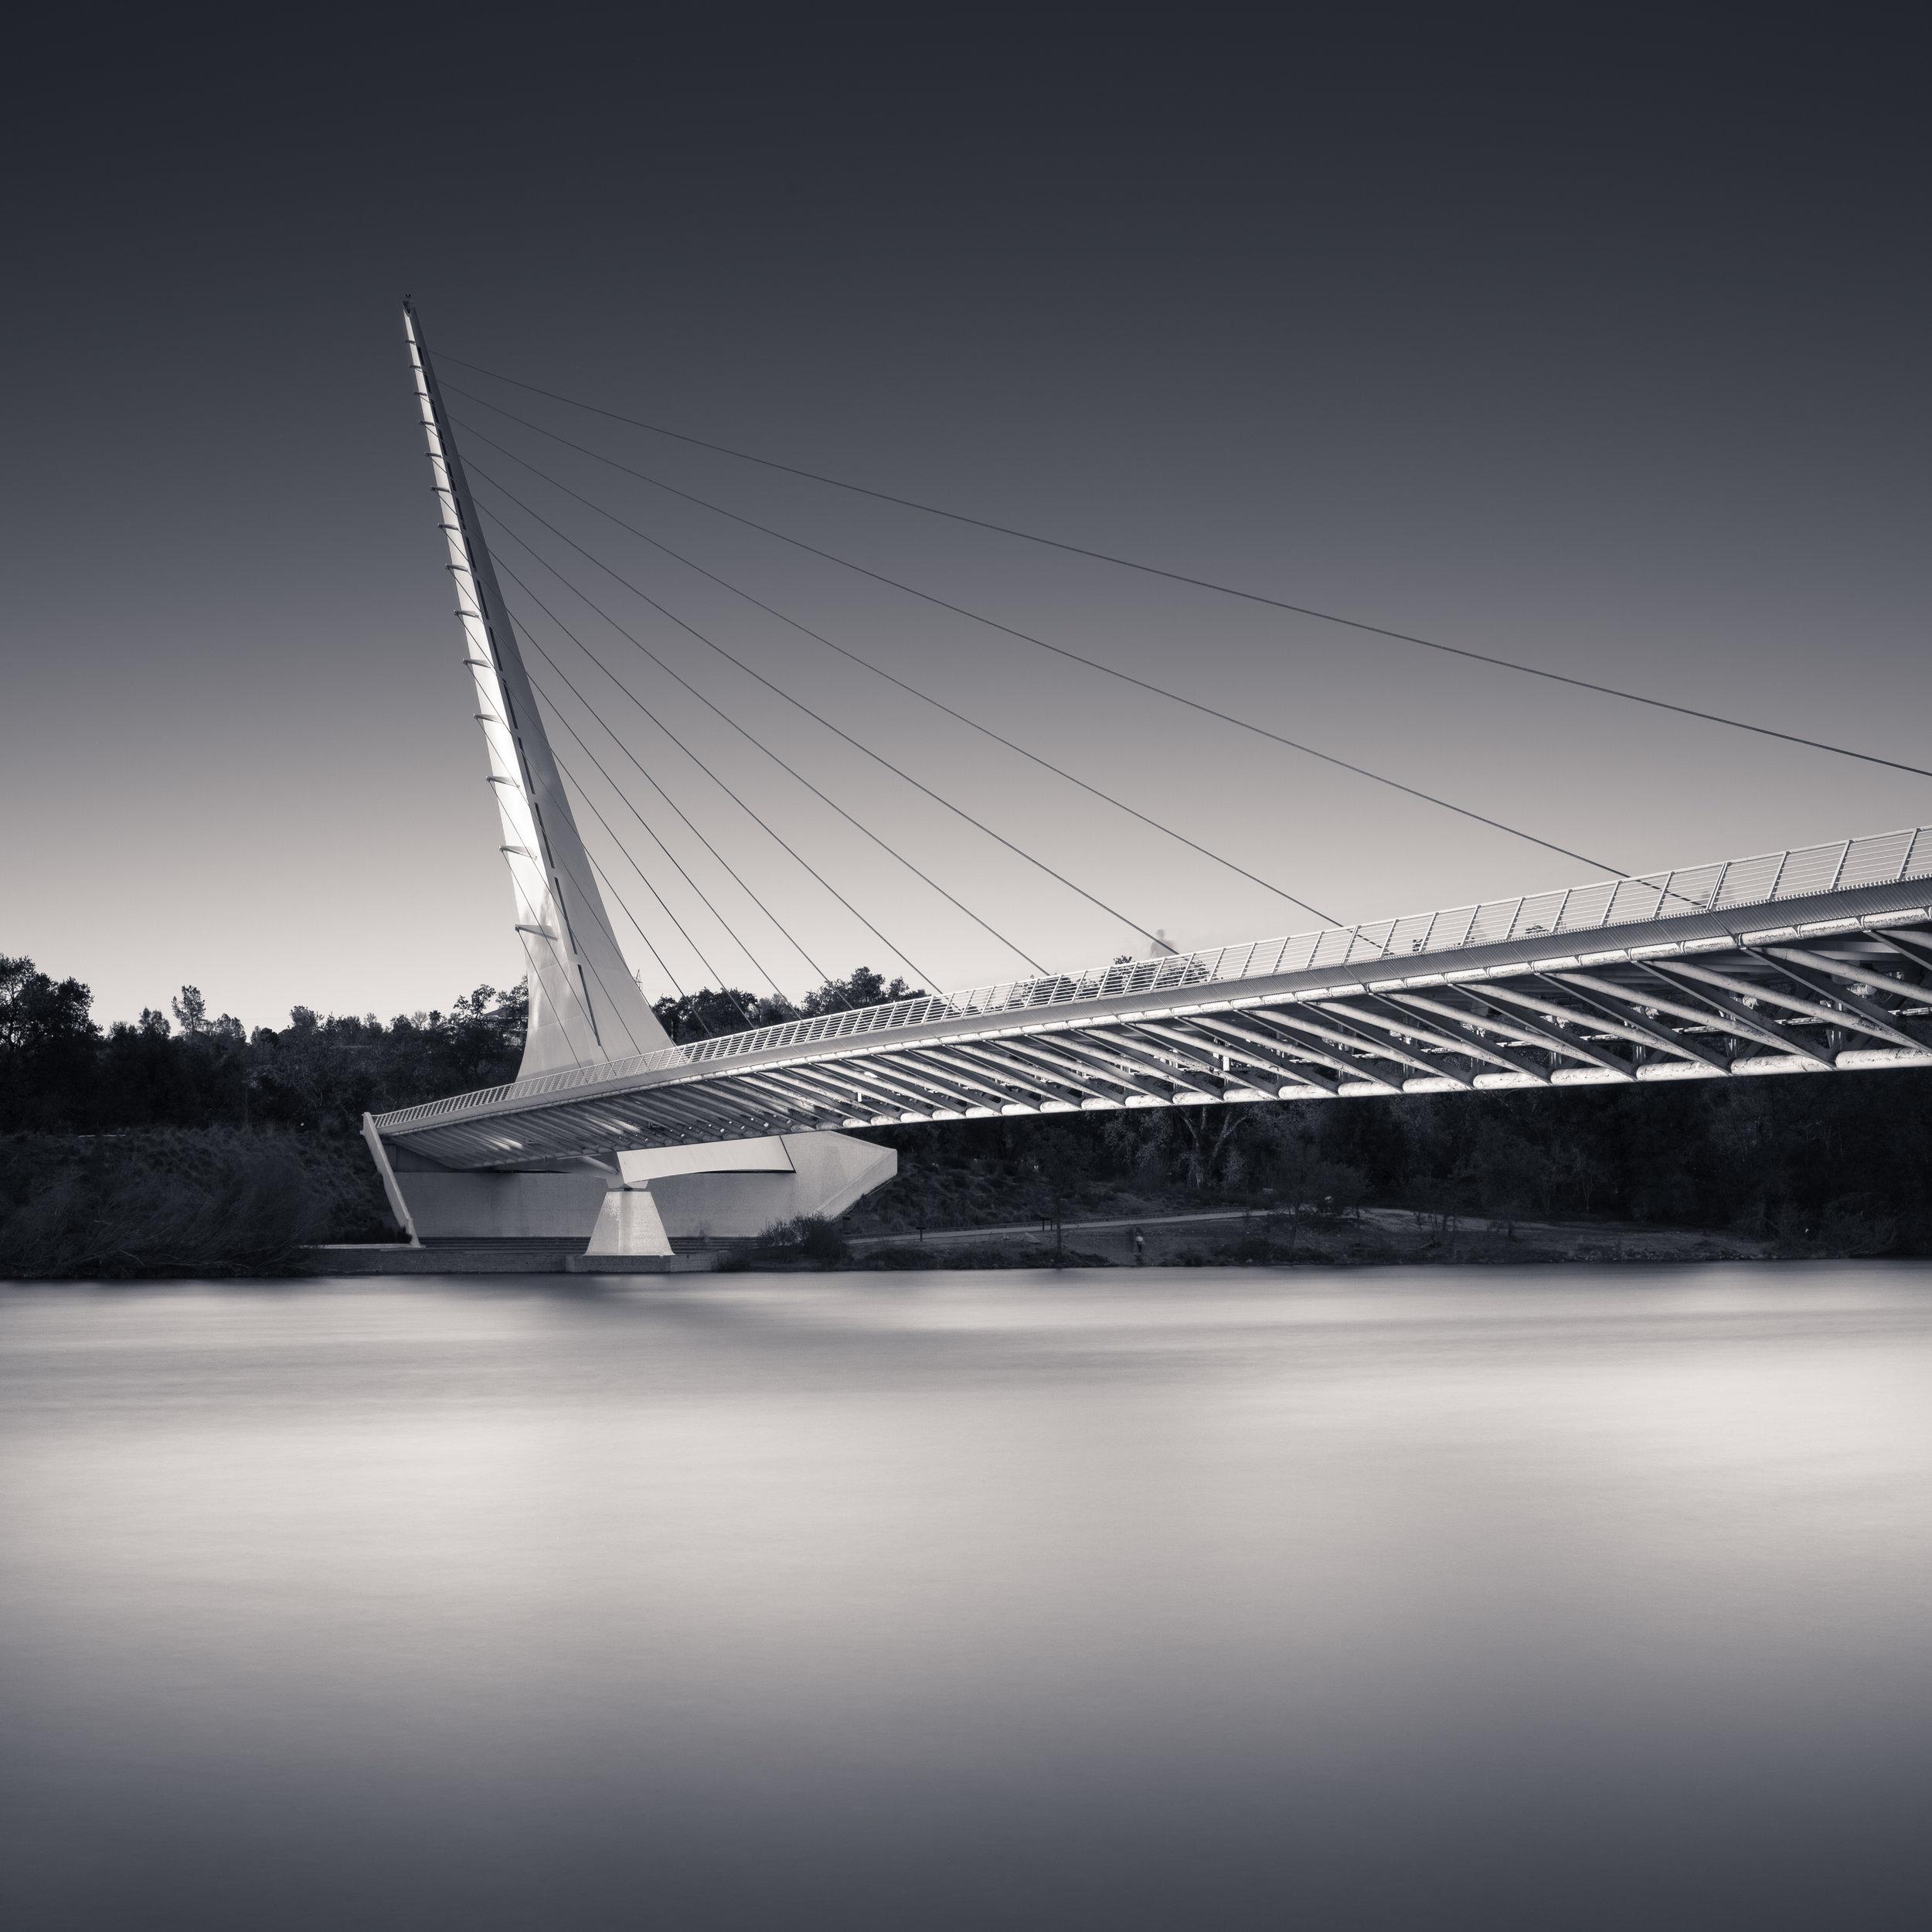 Redding black white sundial bridge sacramento river evening